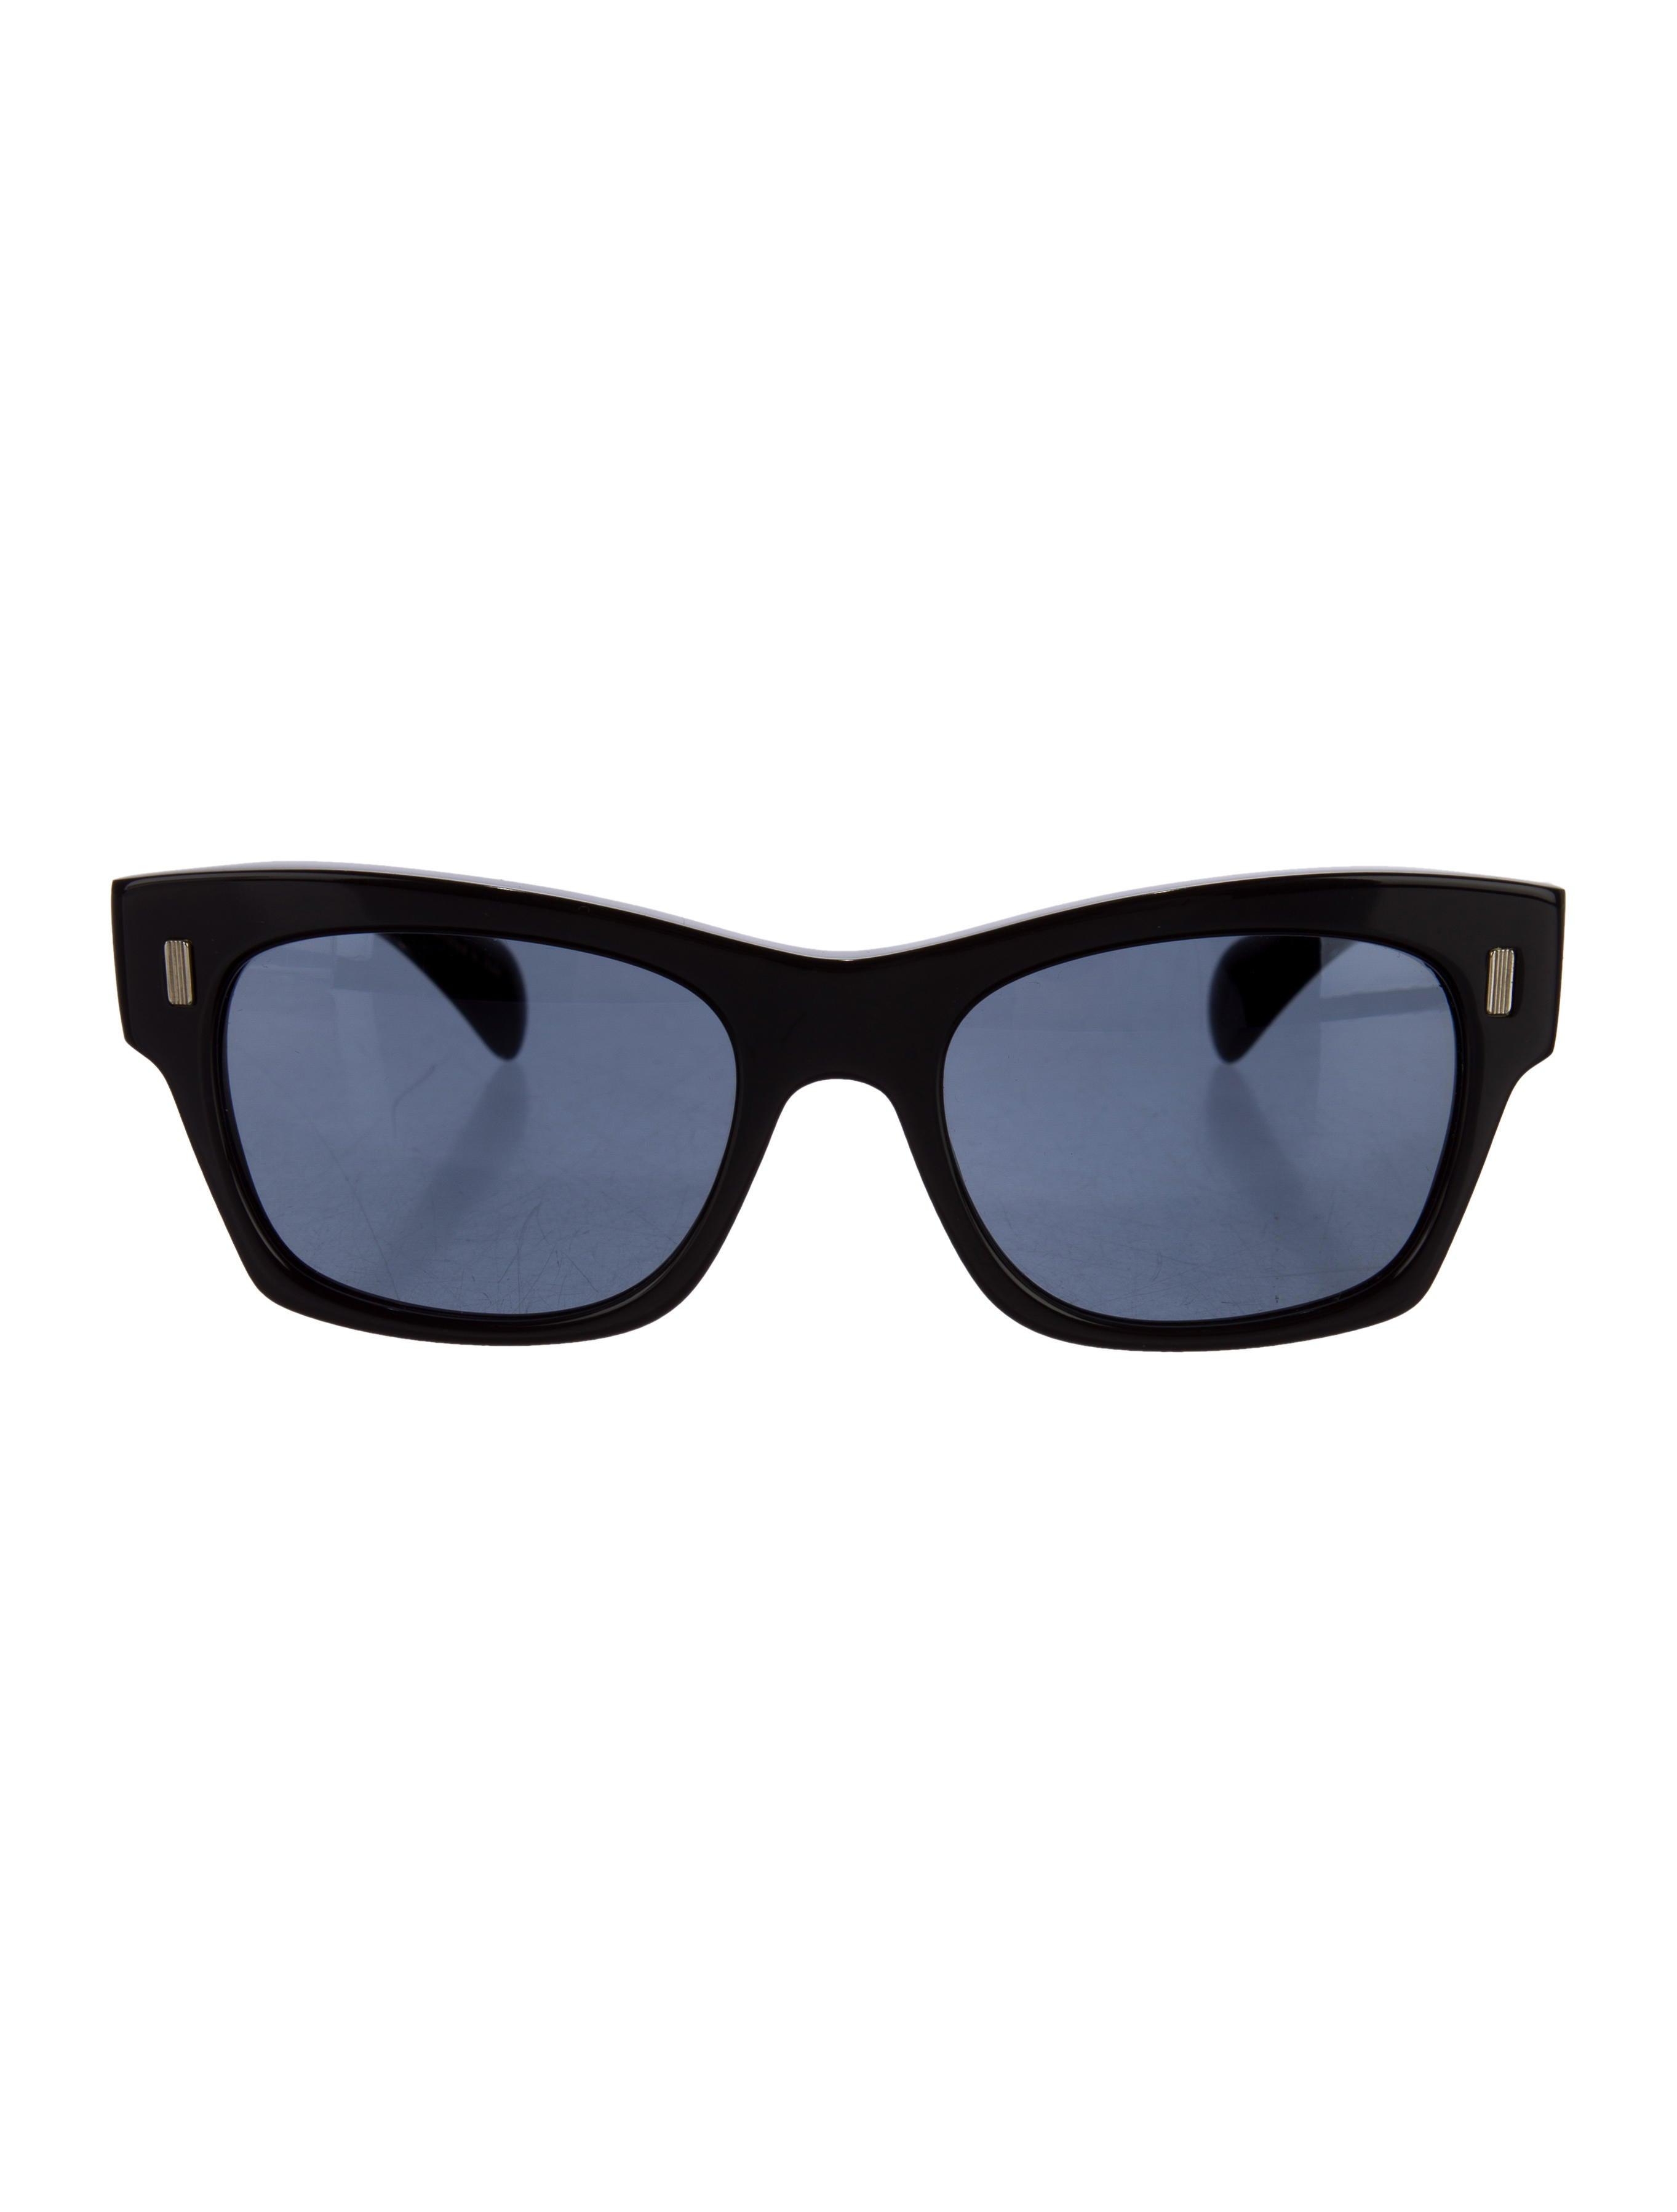 c9351dc7da The Row x Oliver Peoples 71st Street Wayfarer Sunglasses ...